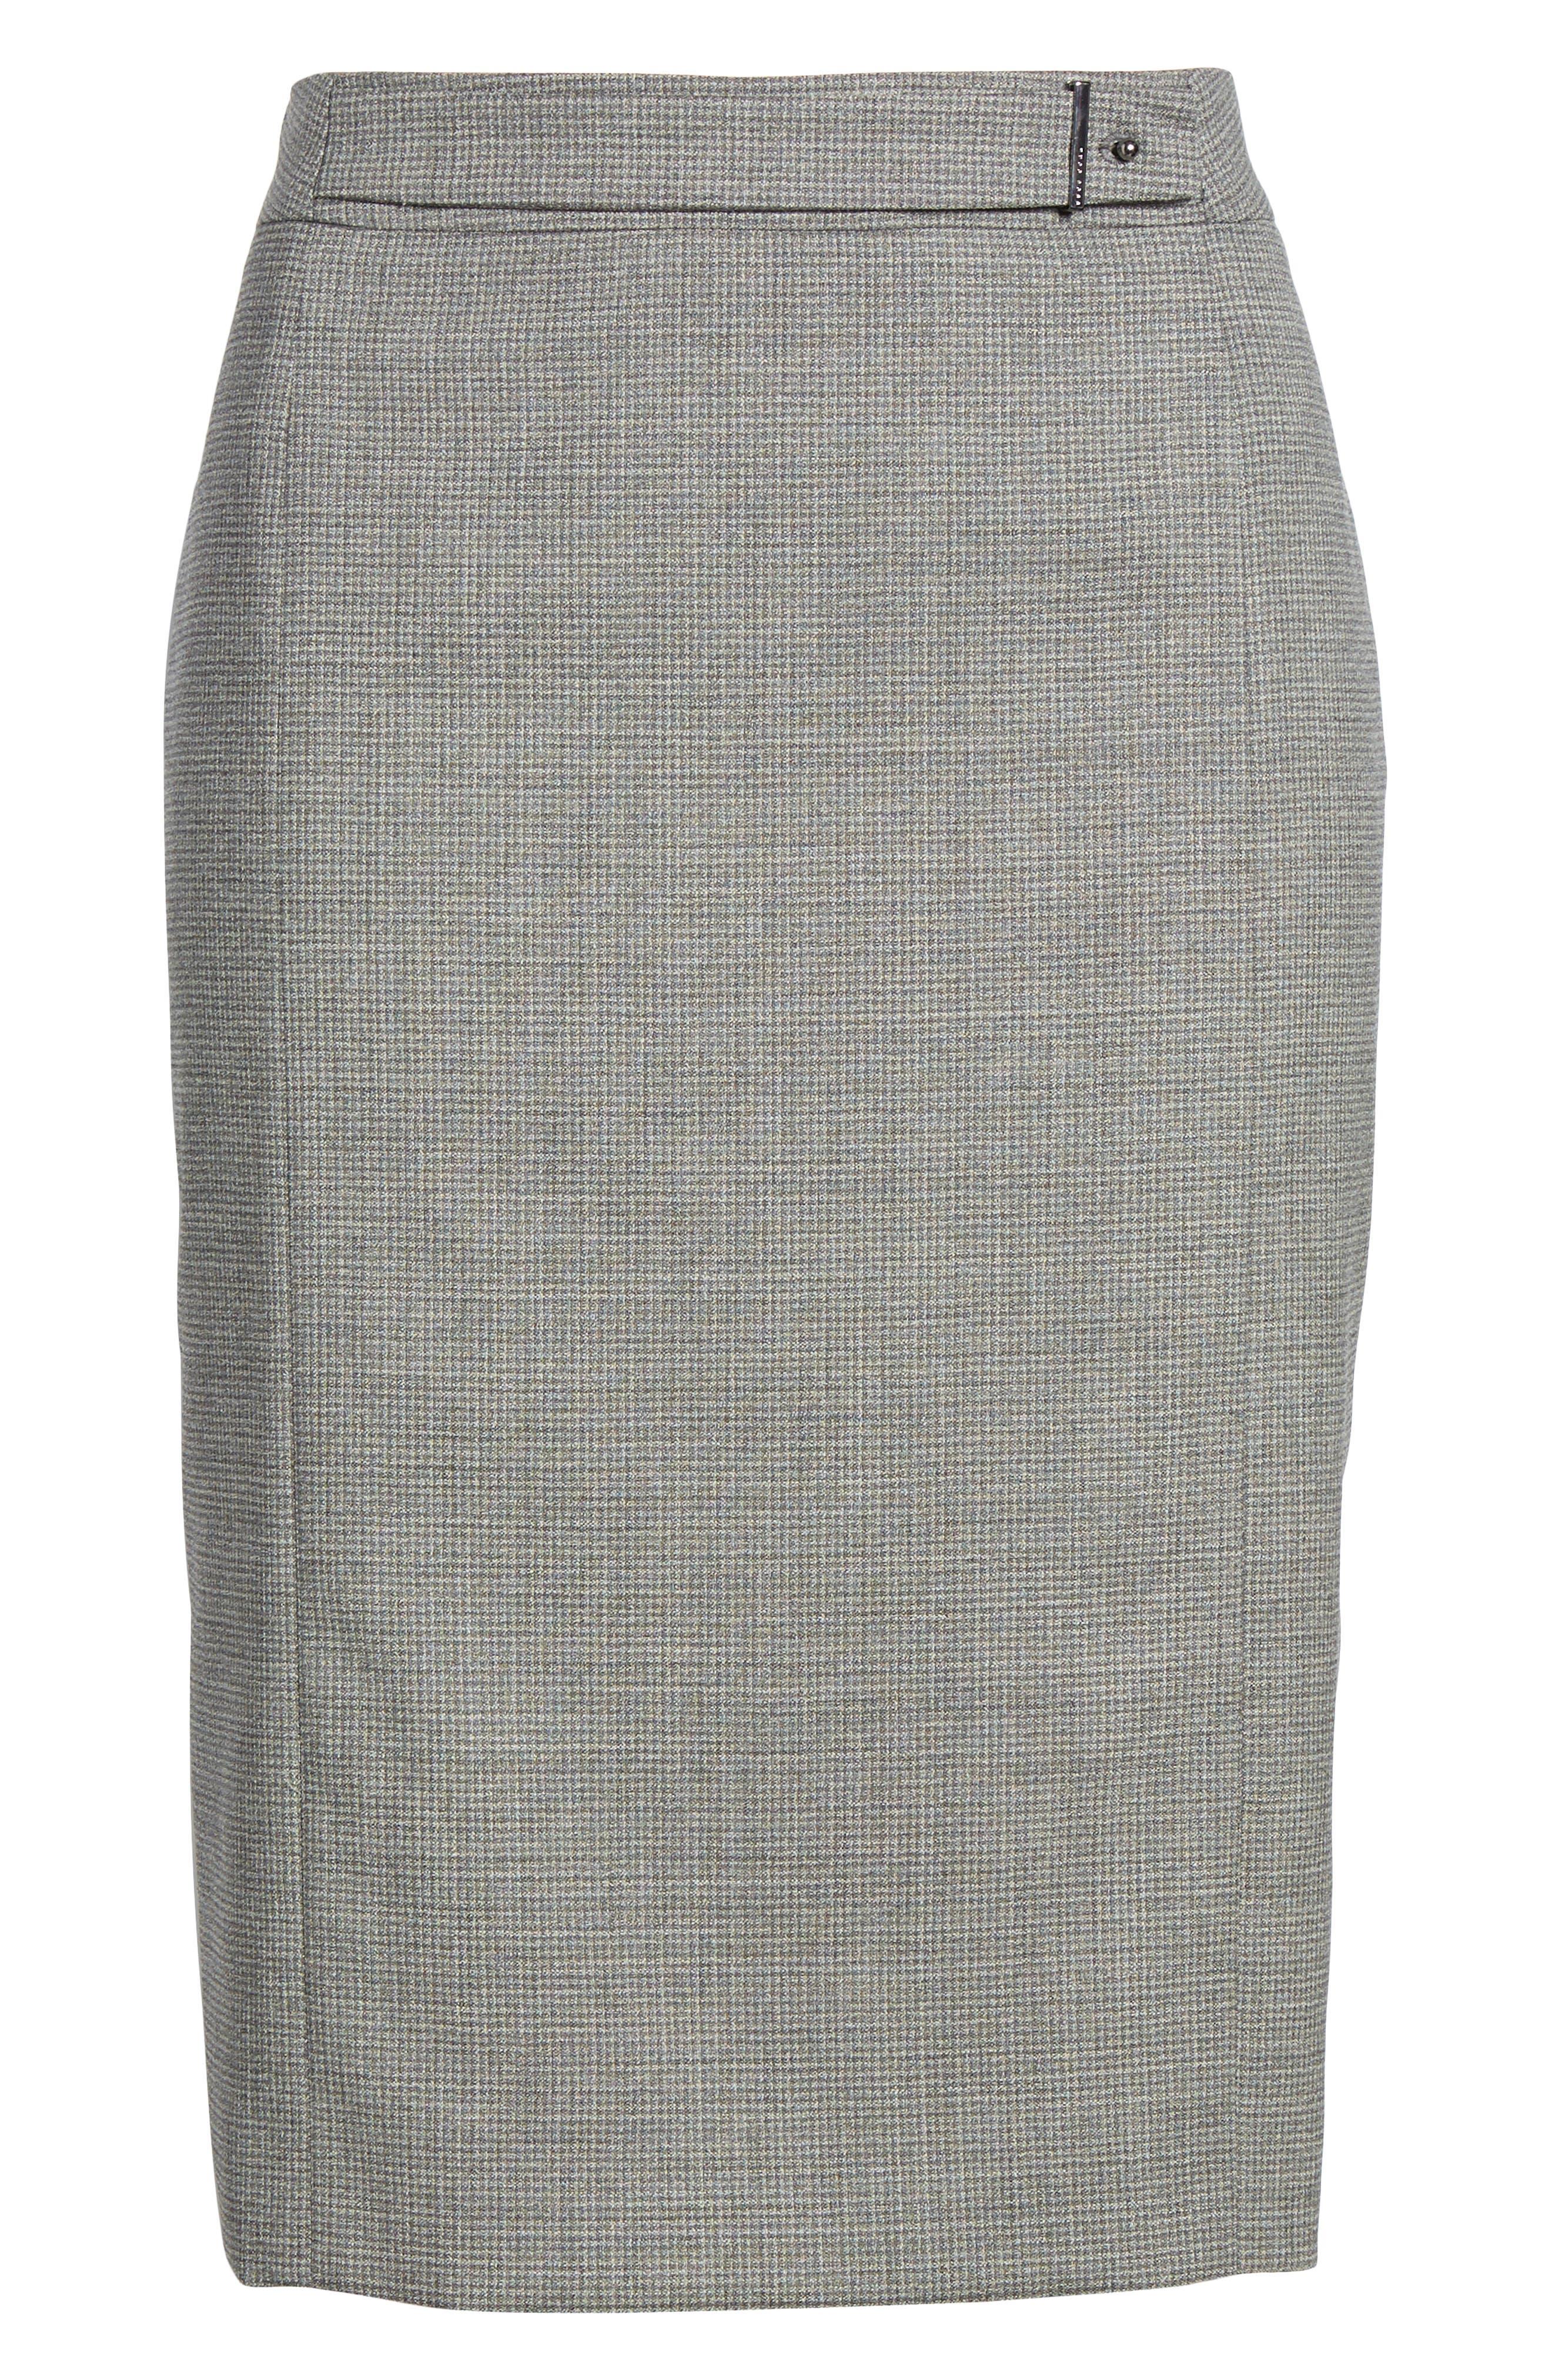 Vewisa Check Wool Suit Skirt,                             Alternate thumbnail 6, color,